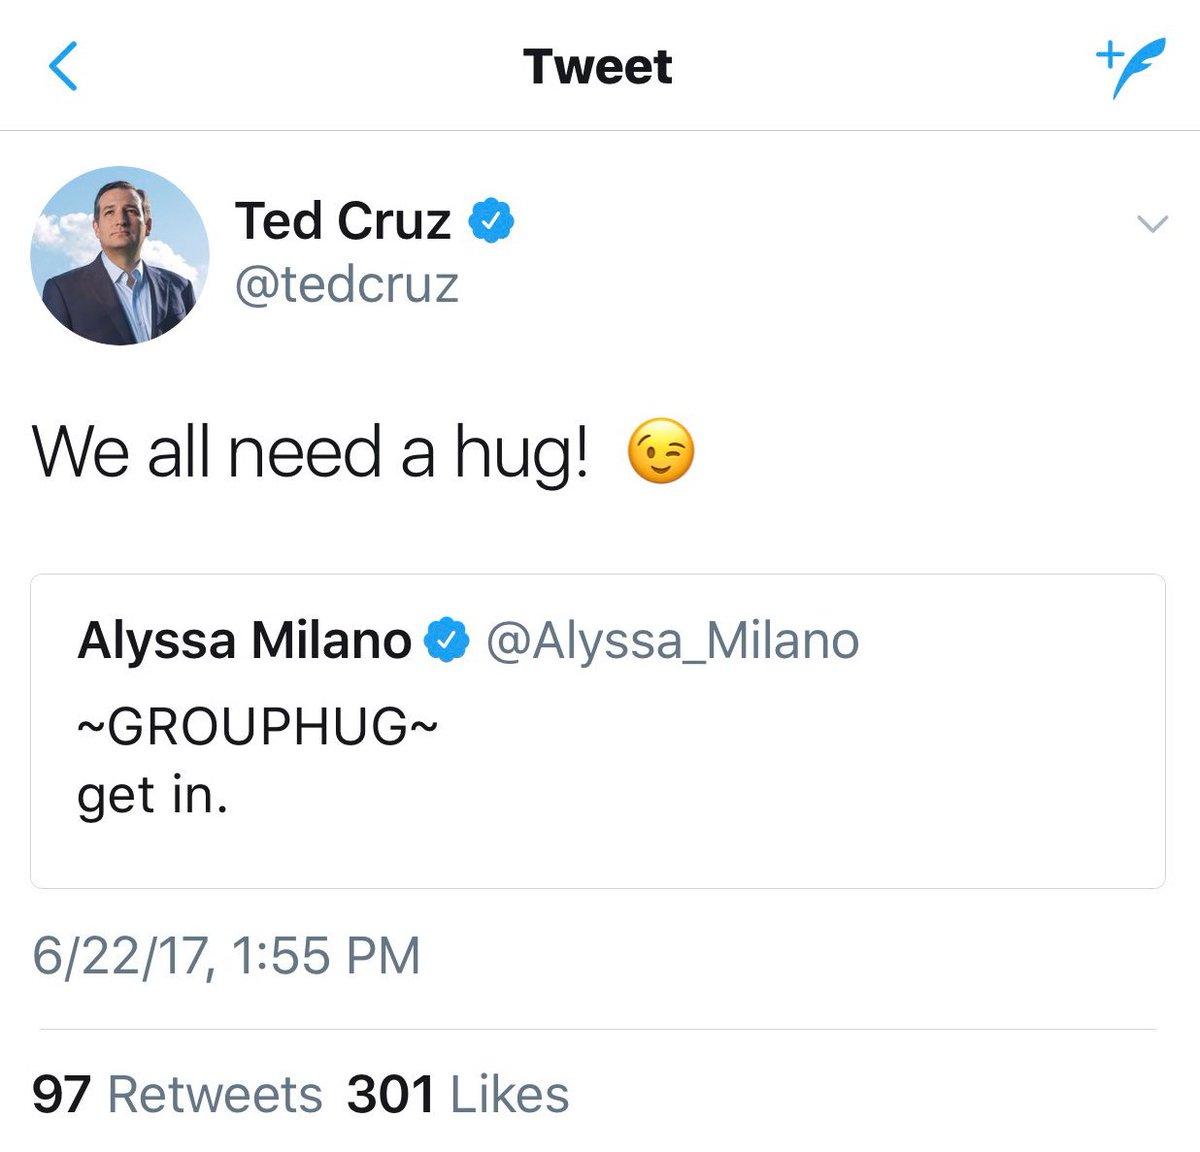 Not you, @tedcruz. You're not invited. 😉 https://t.co/1NTZFvwk9h